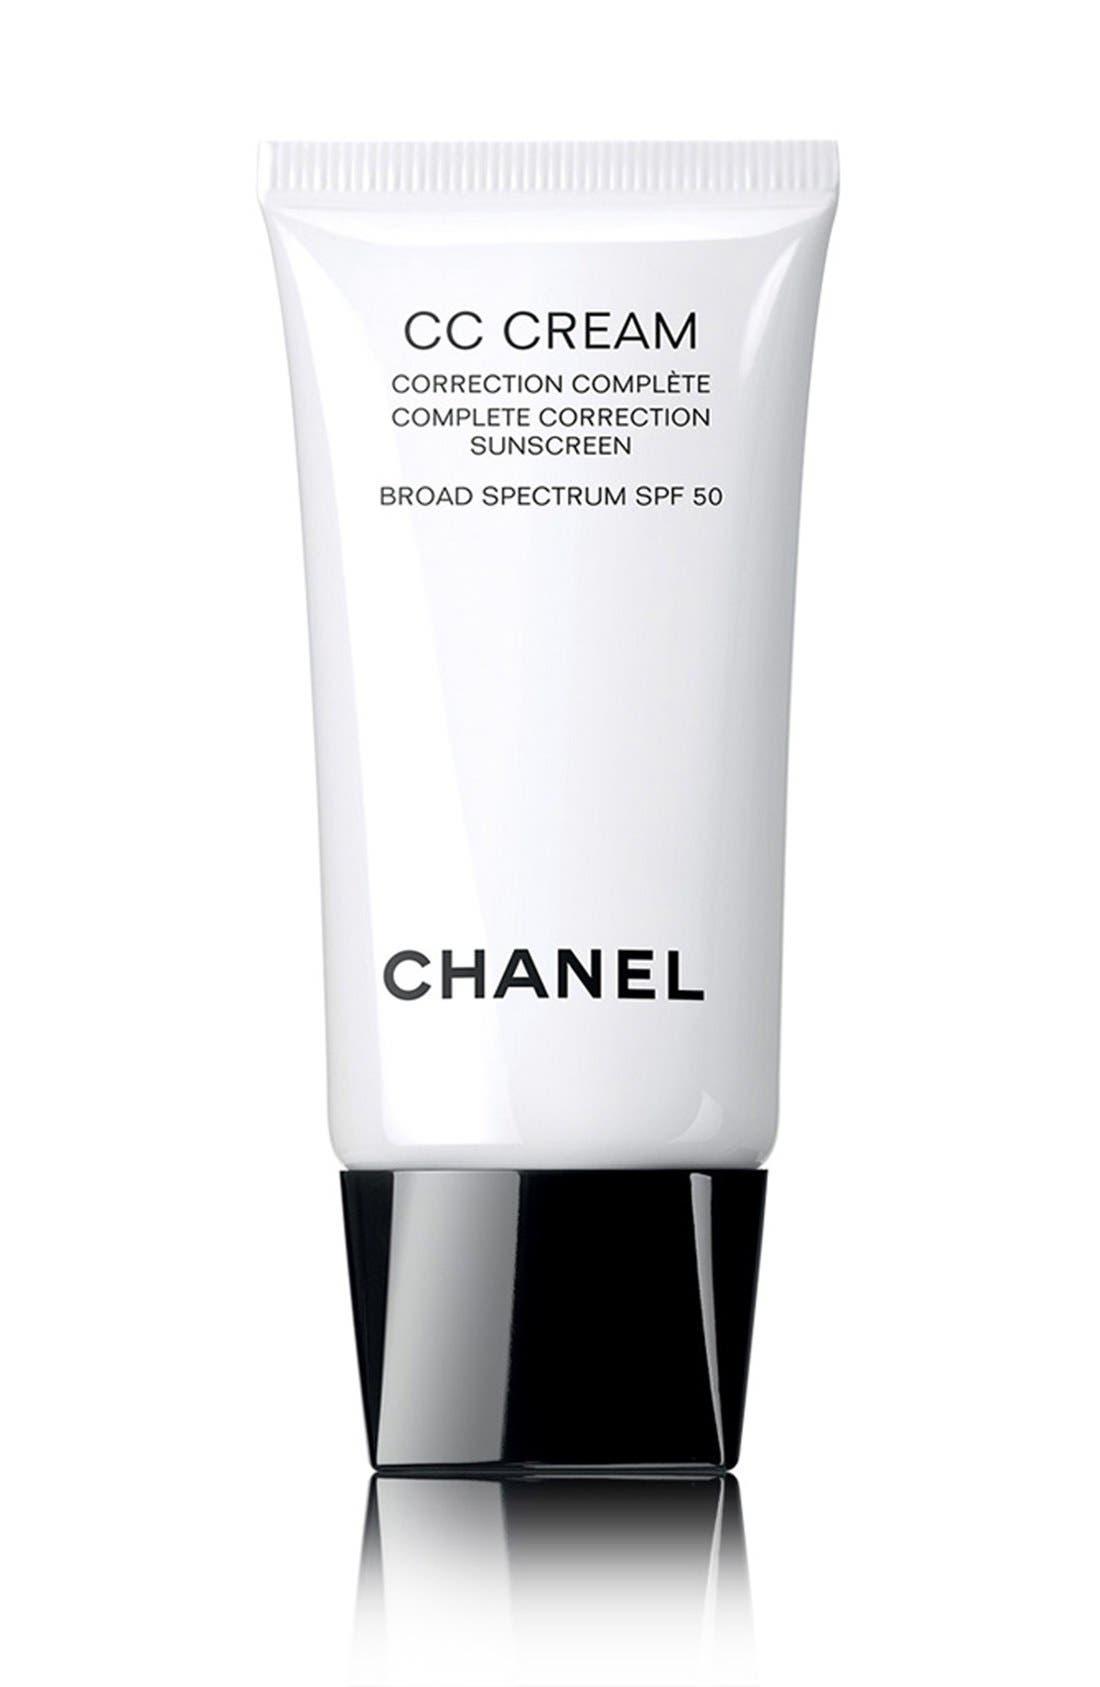 CC CREAM<br />Complete Correction Sunscreen Broad Spectrum SPF 50,                             Main thumbnail 2, color,